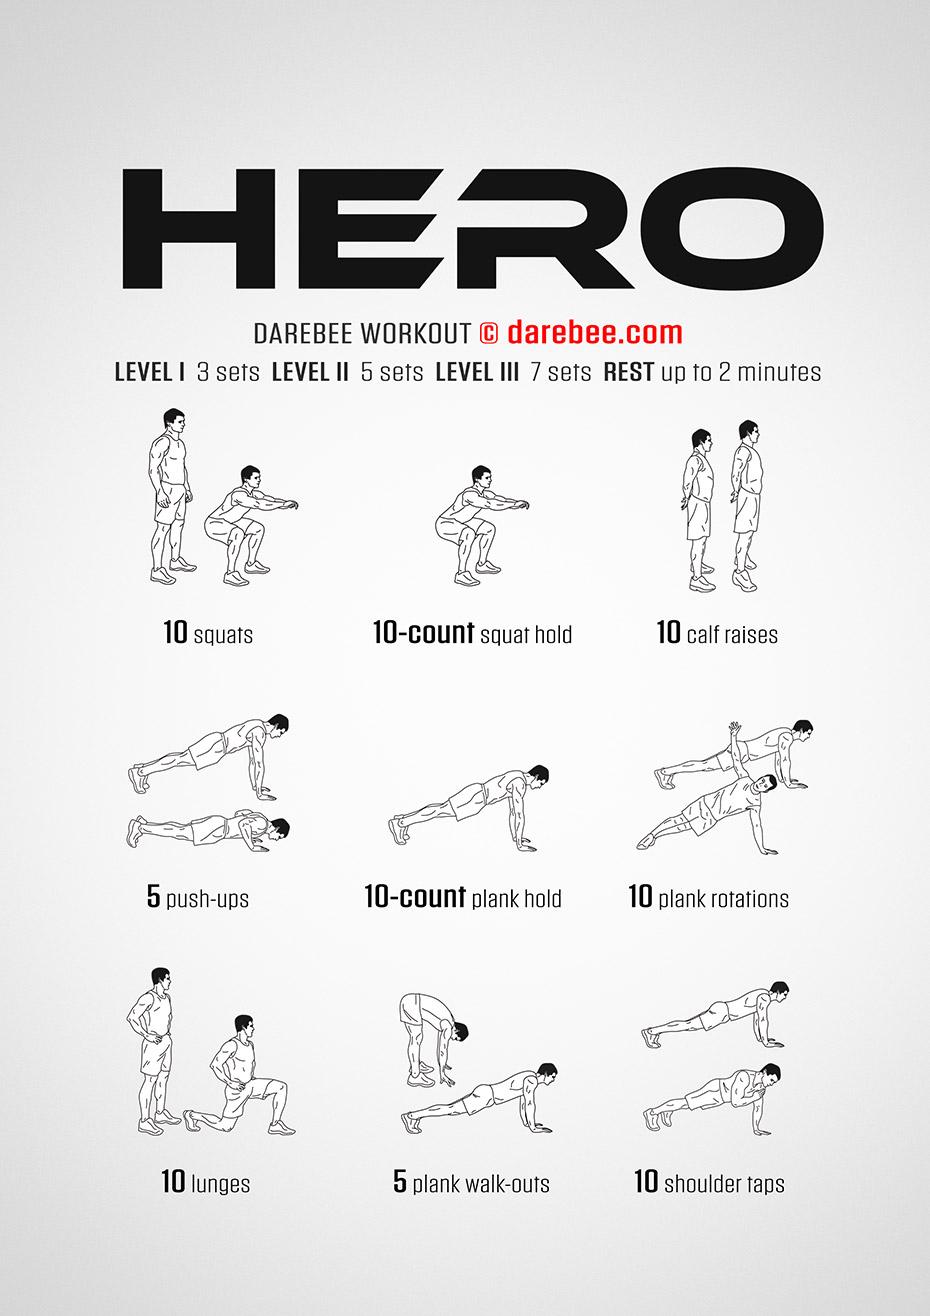 Saitama Workout Routine Results - Hero Workout